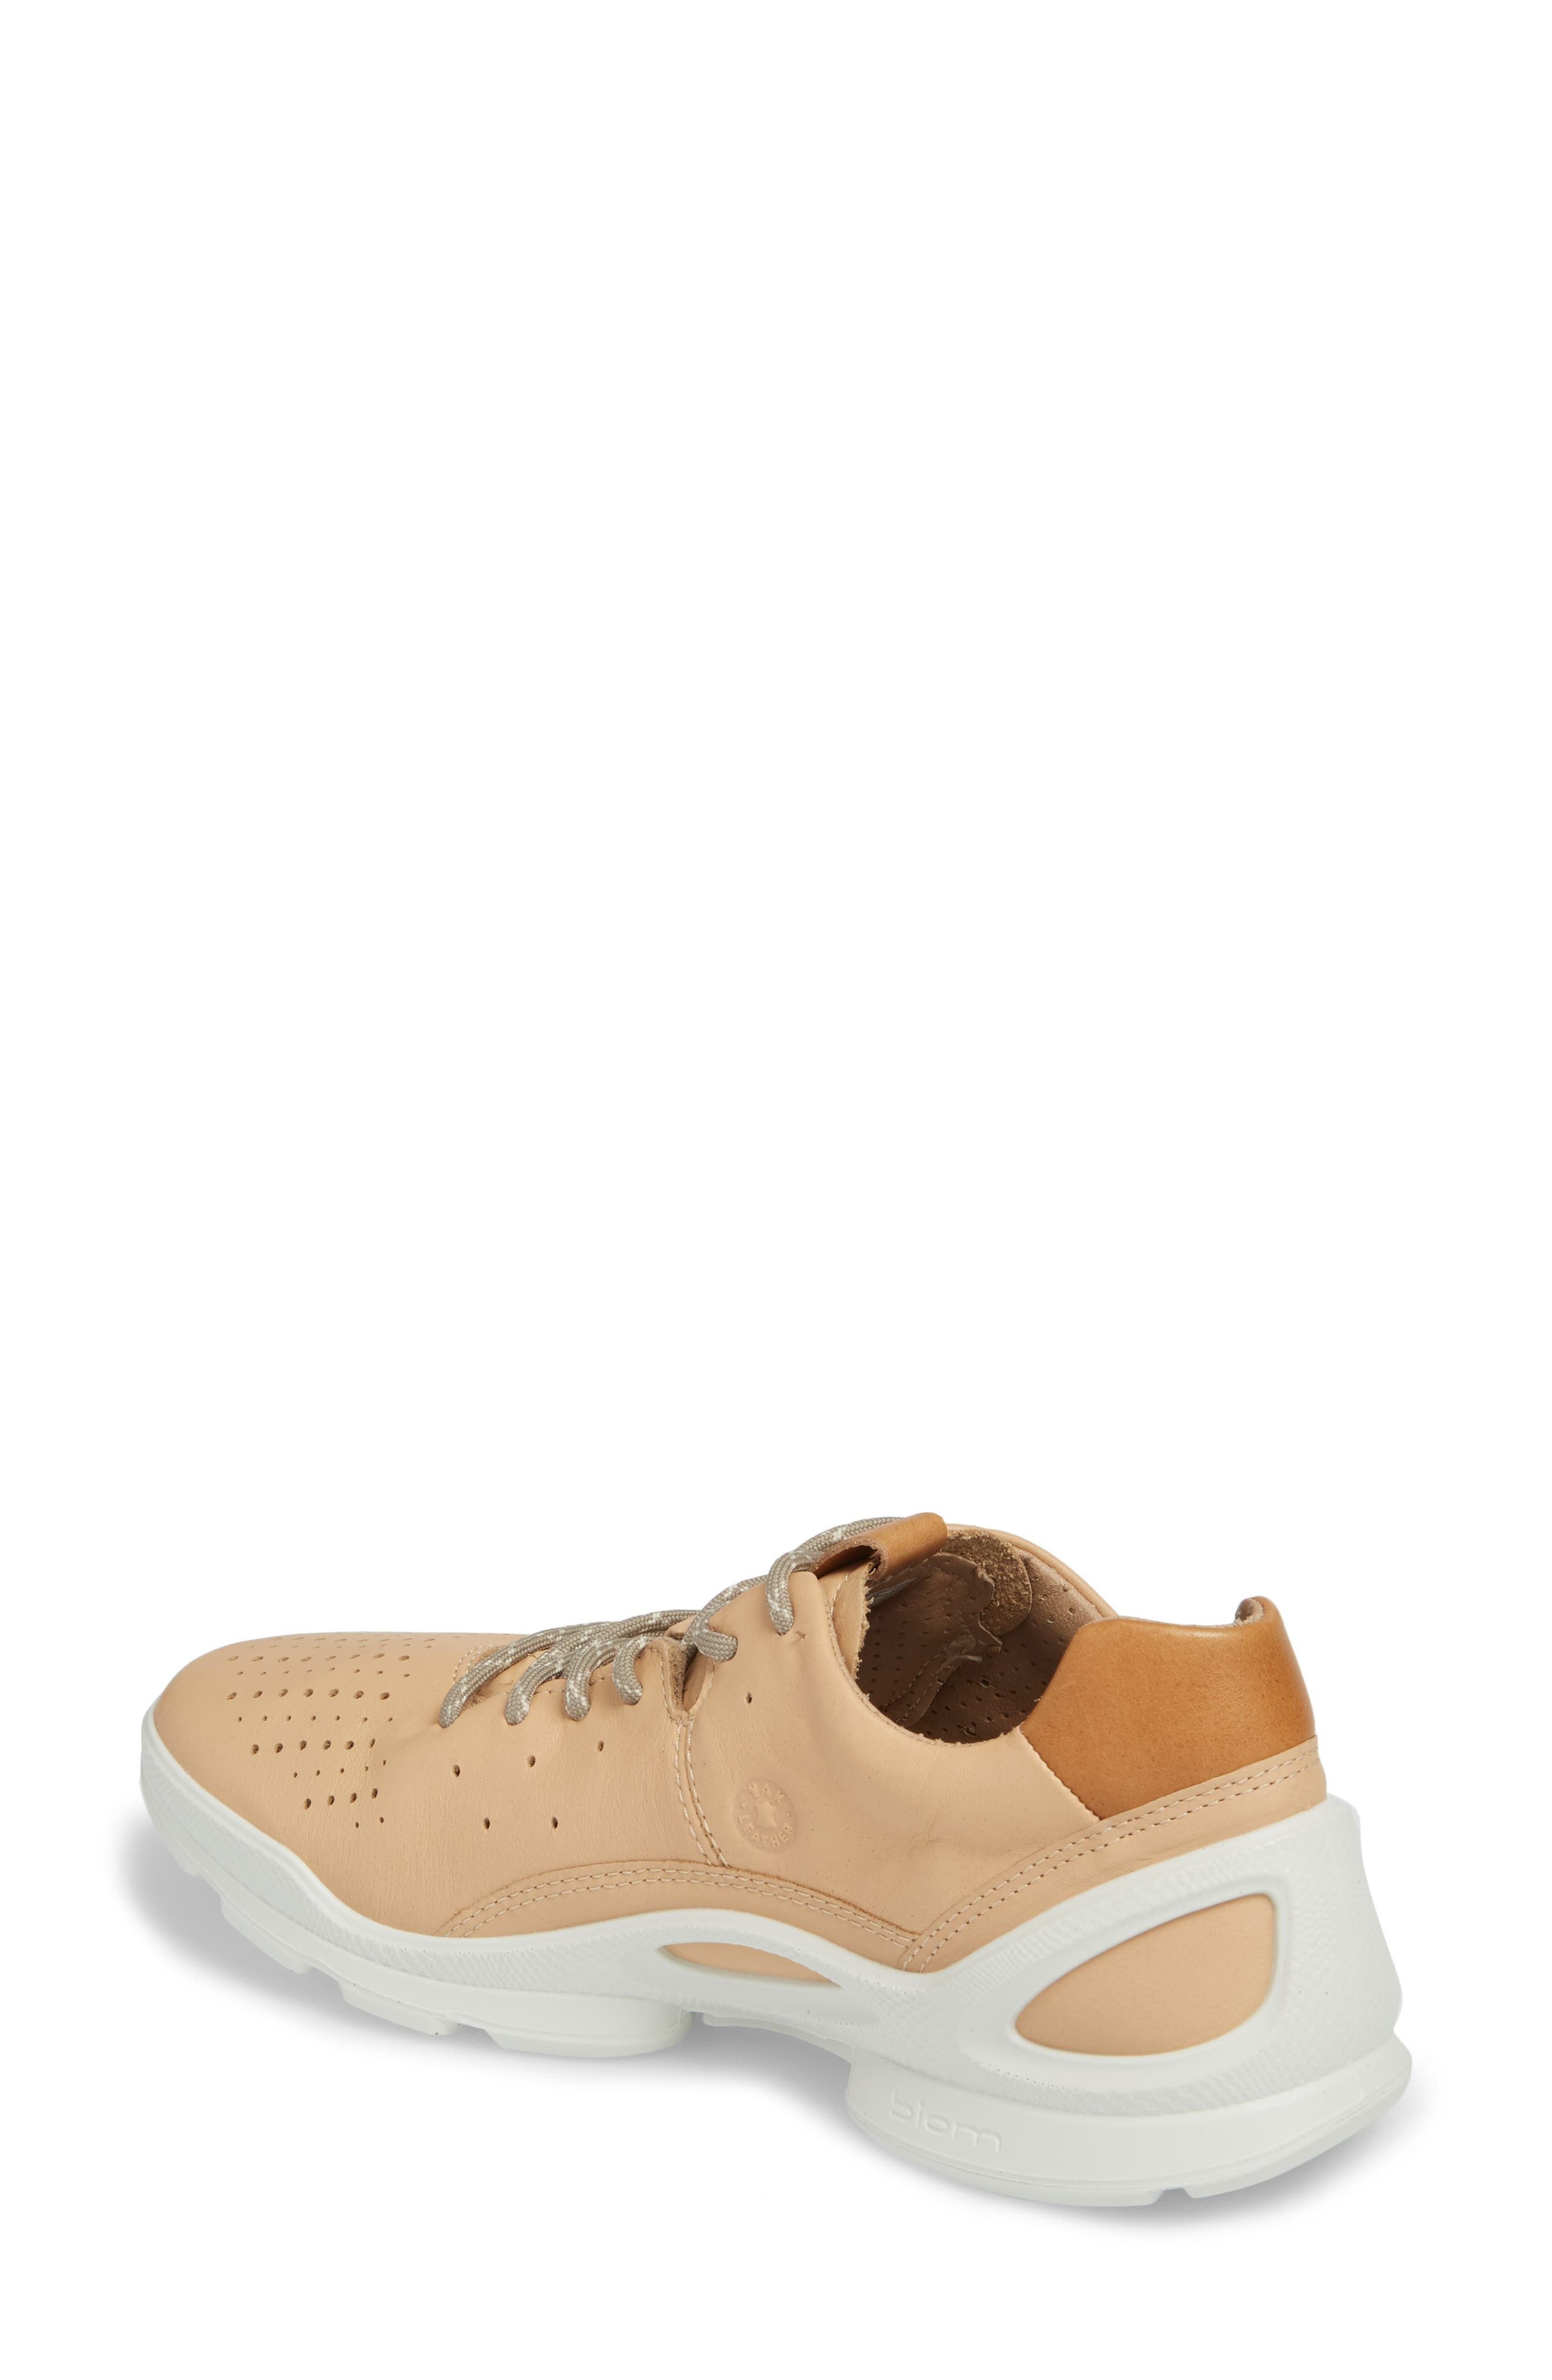 Biom Street Sneaker,                             Alternate thumbnail 2, color,                             Powder Leather